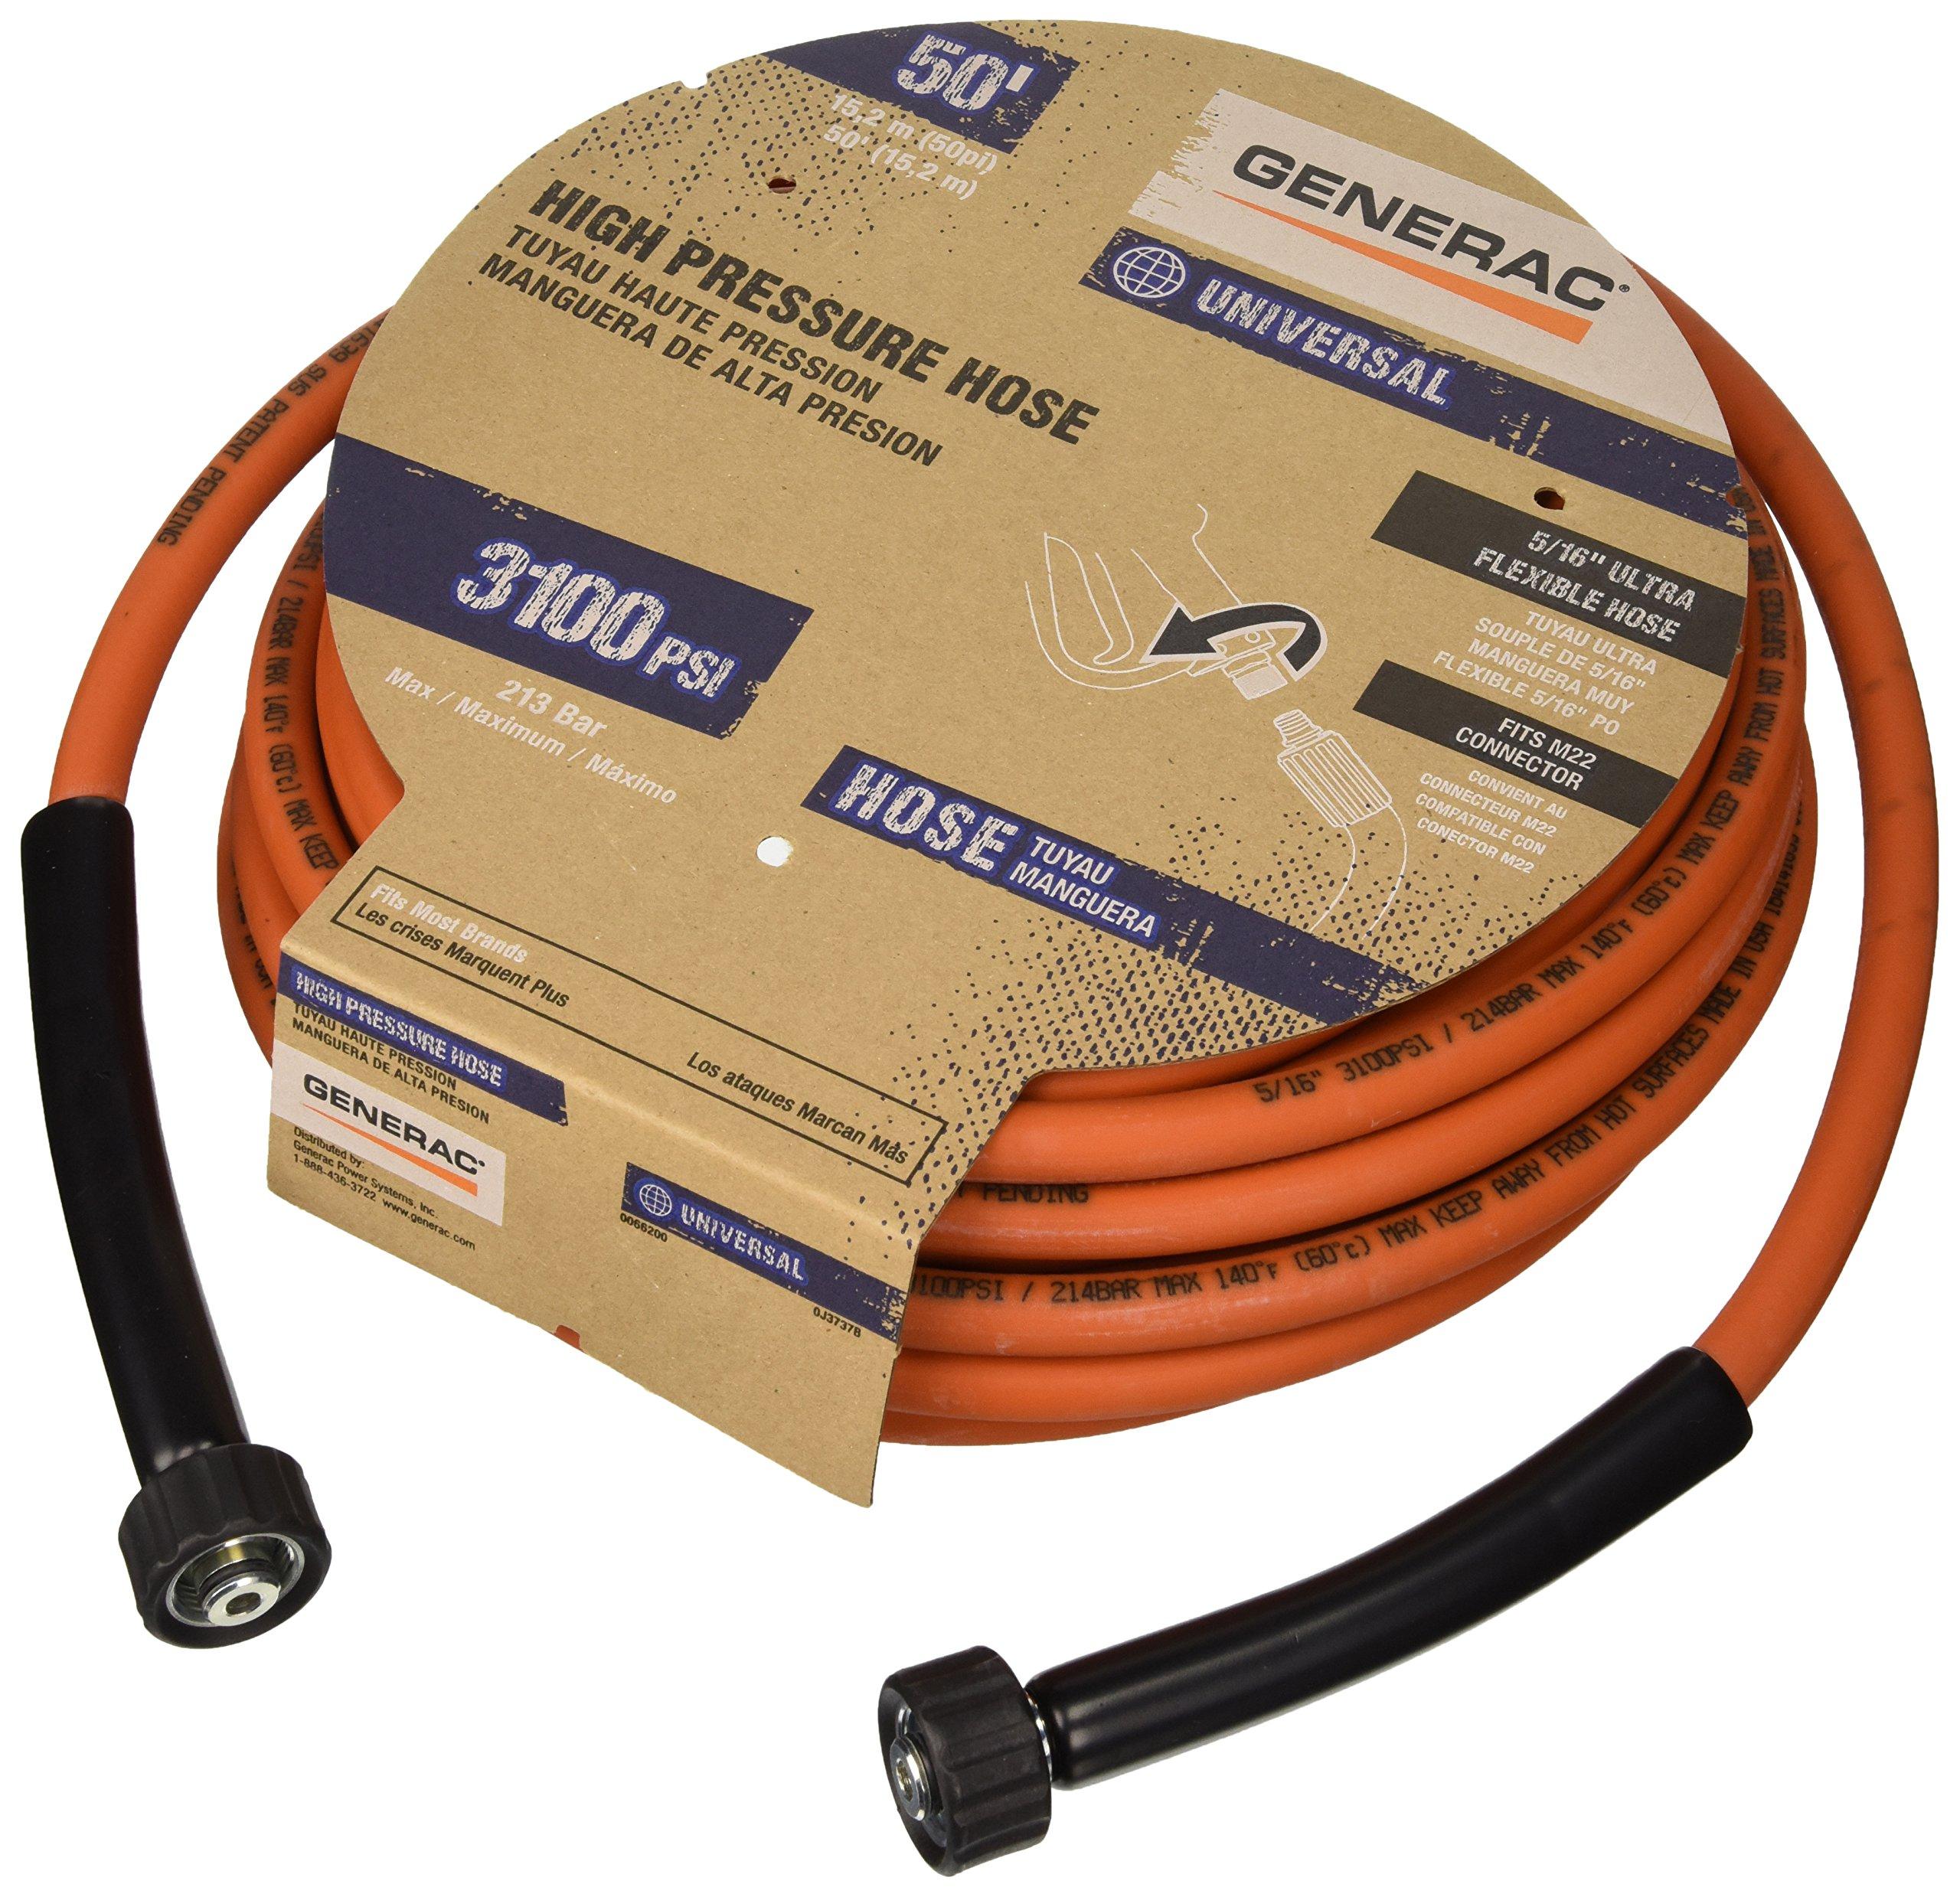 Generac 6620 Pressure Washer Hose, 50-Feet x 5/16-Inch, Orange by Generac